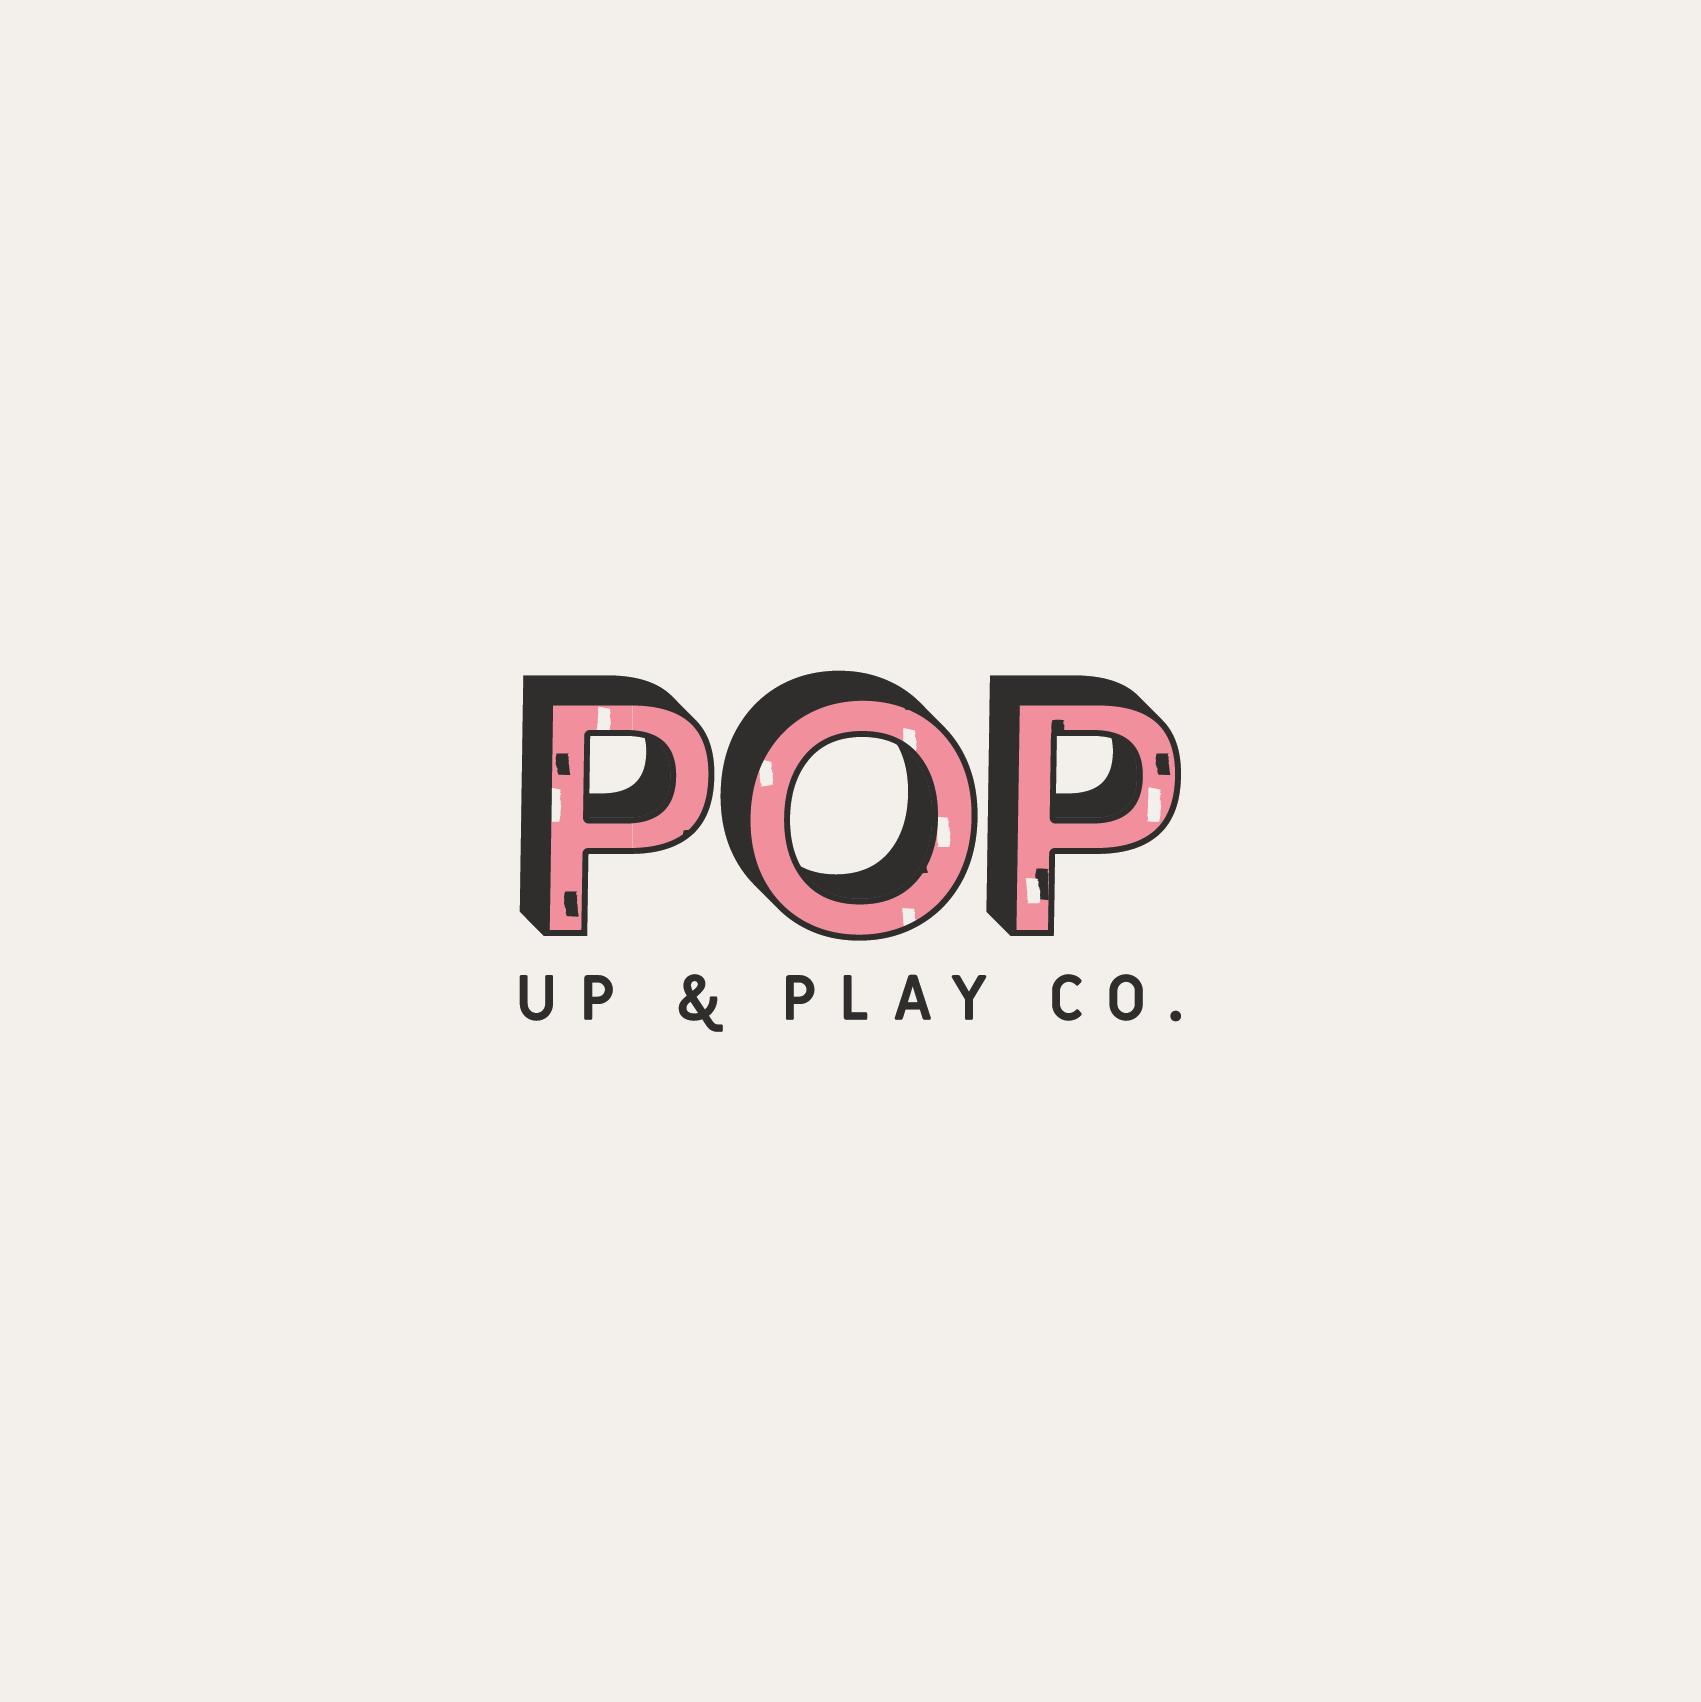 Pop Pink on Cream Sq@2x.png